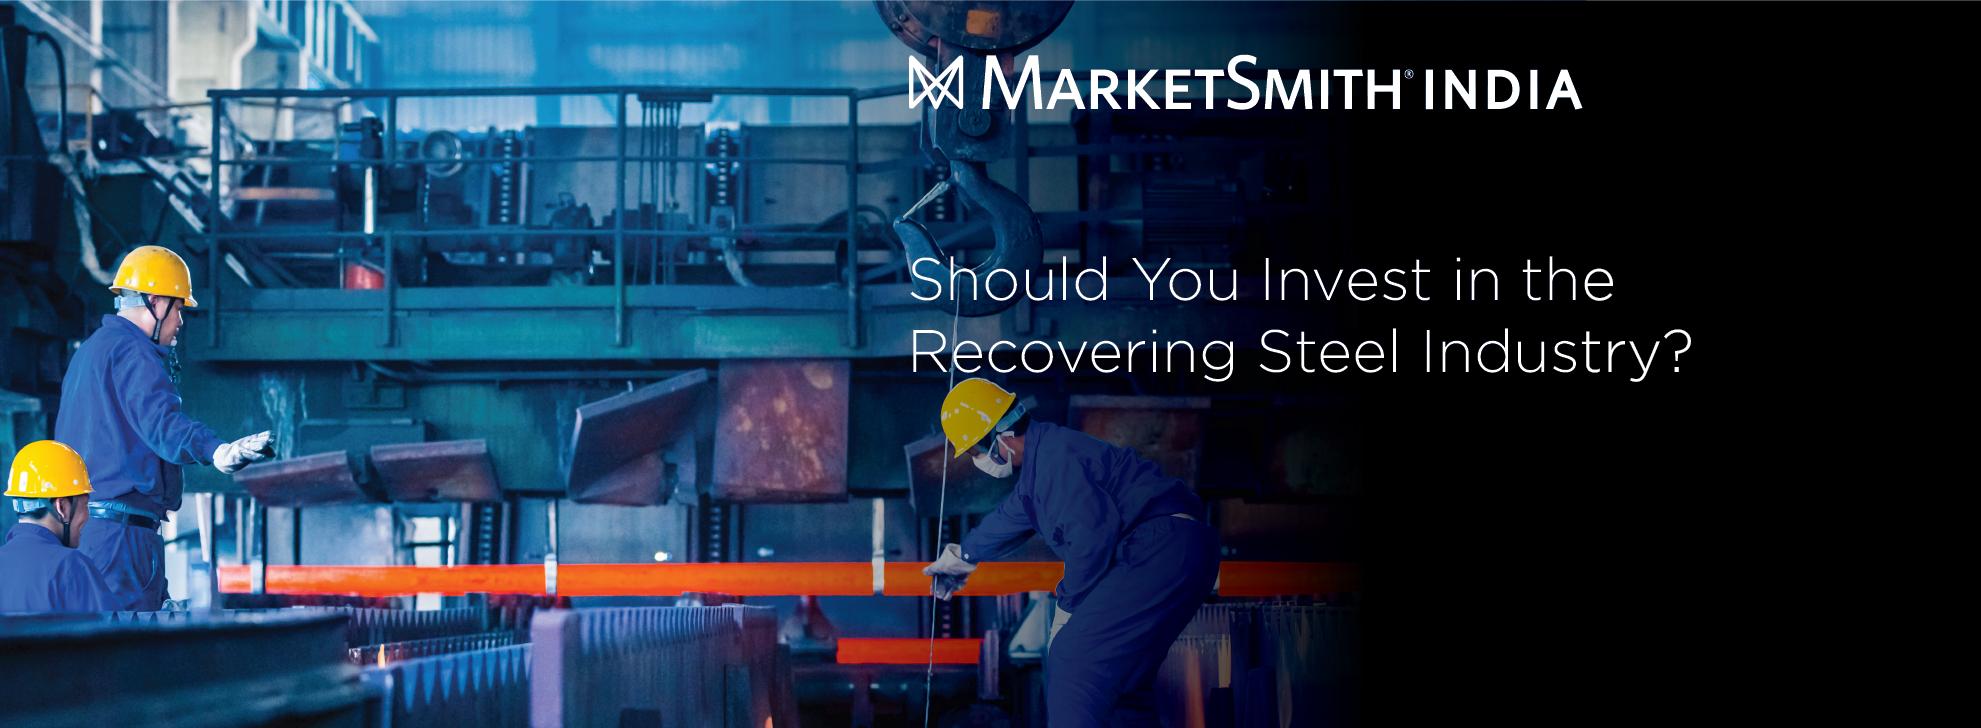 MarketSmith India_Recovering Steel Industry